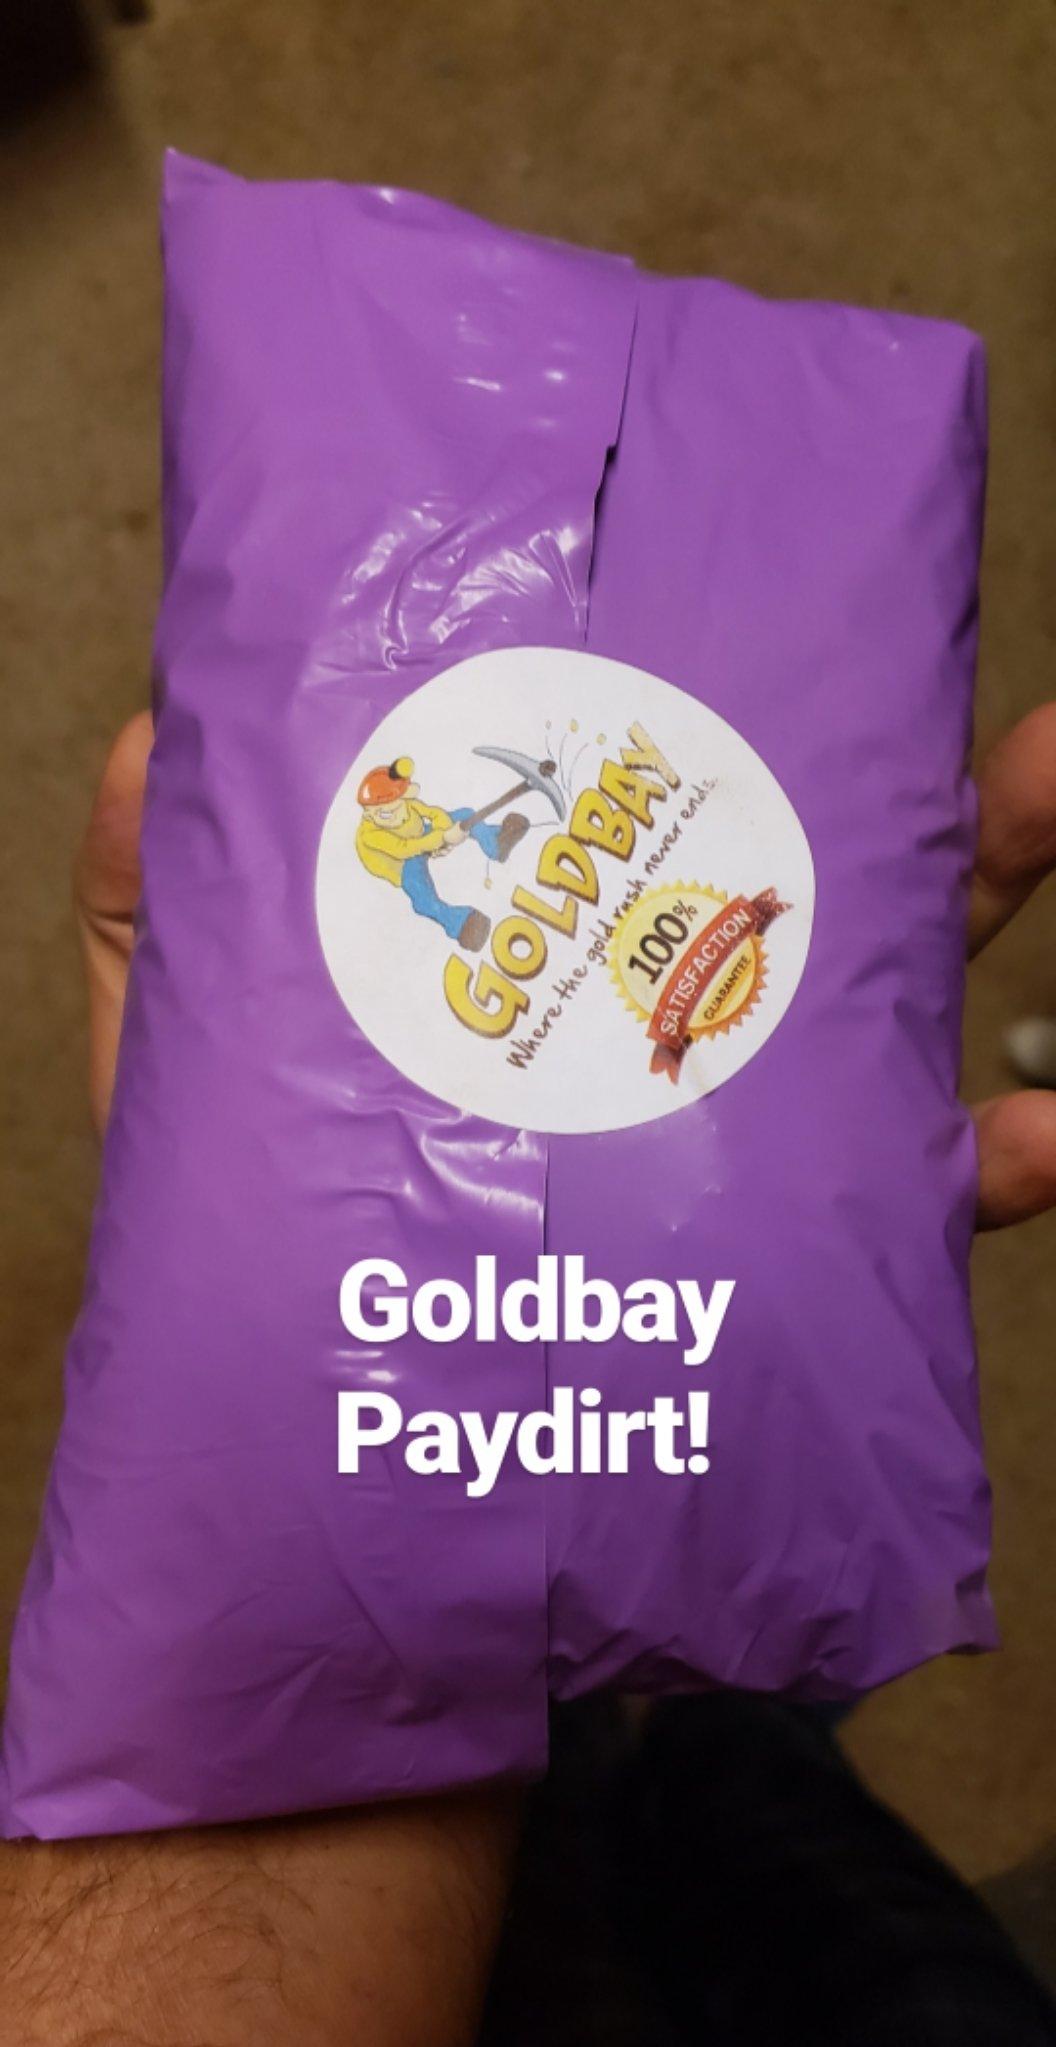 Worlds rarest paydirt - Colorado Quartz gold mine